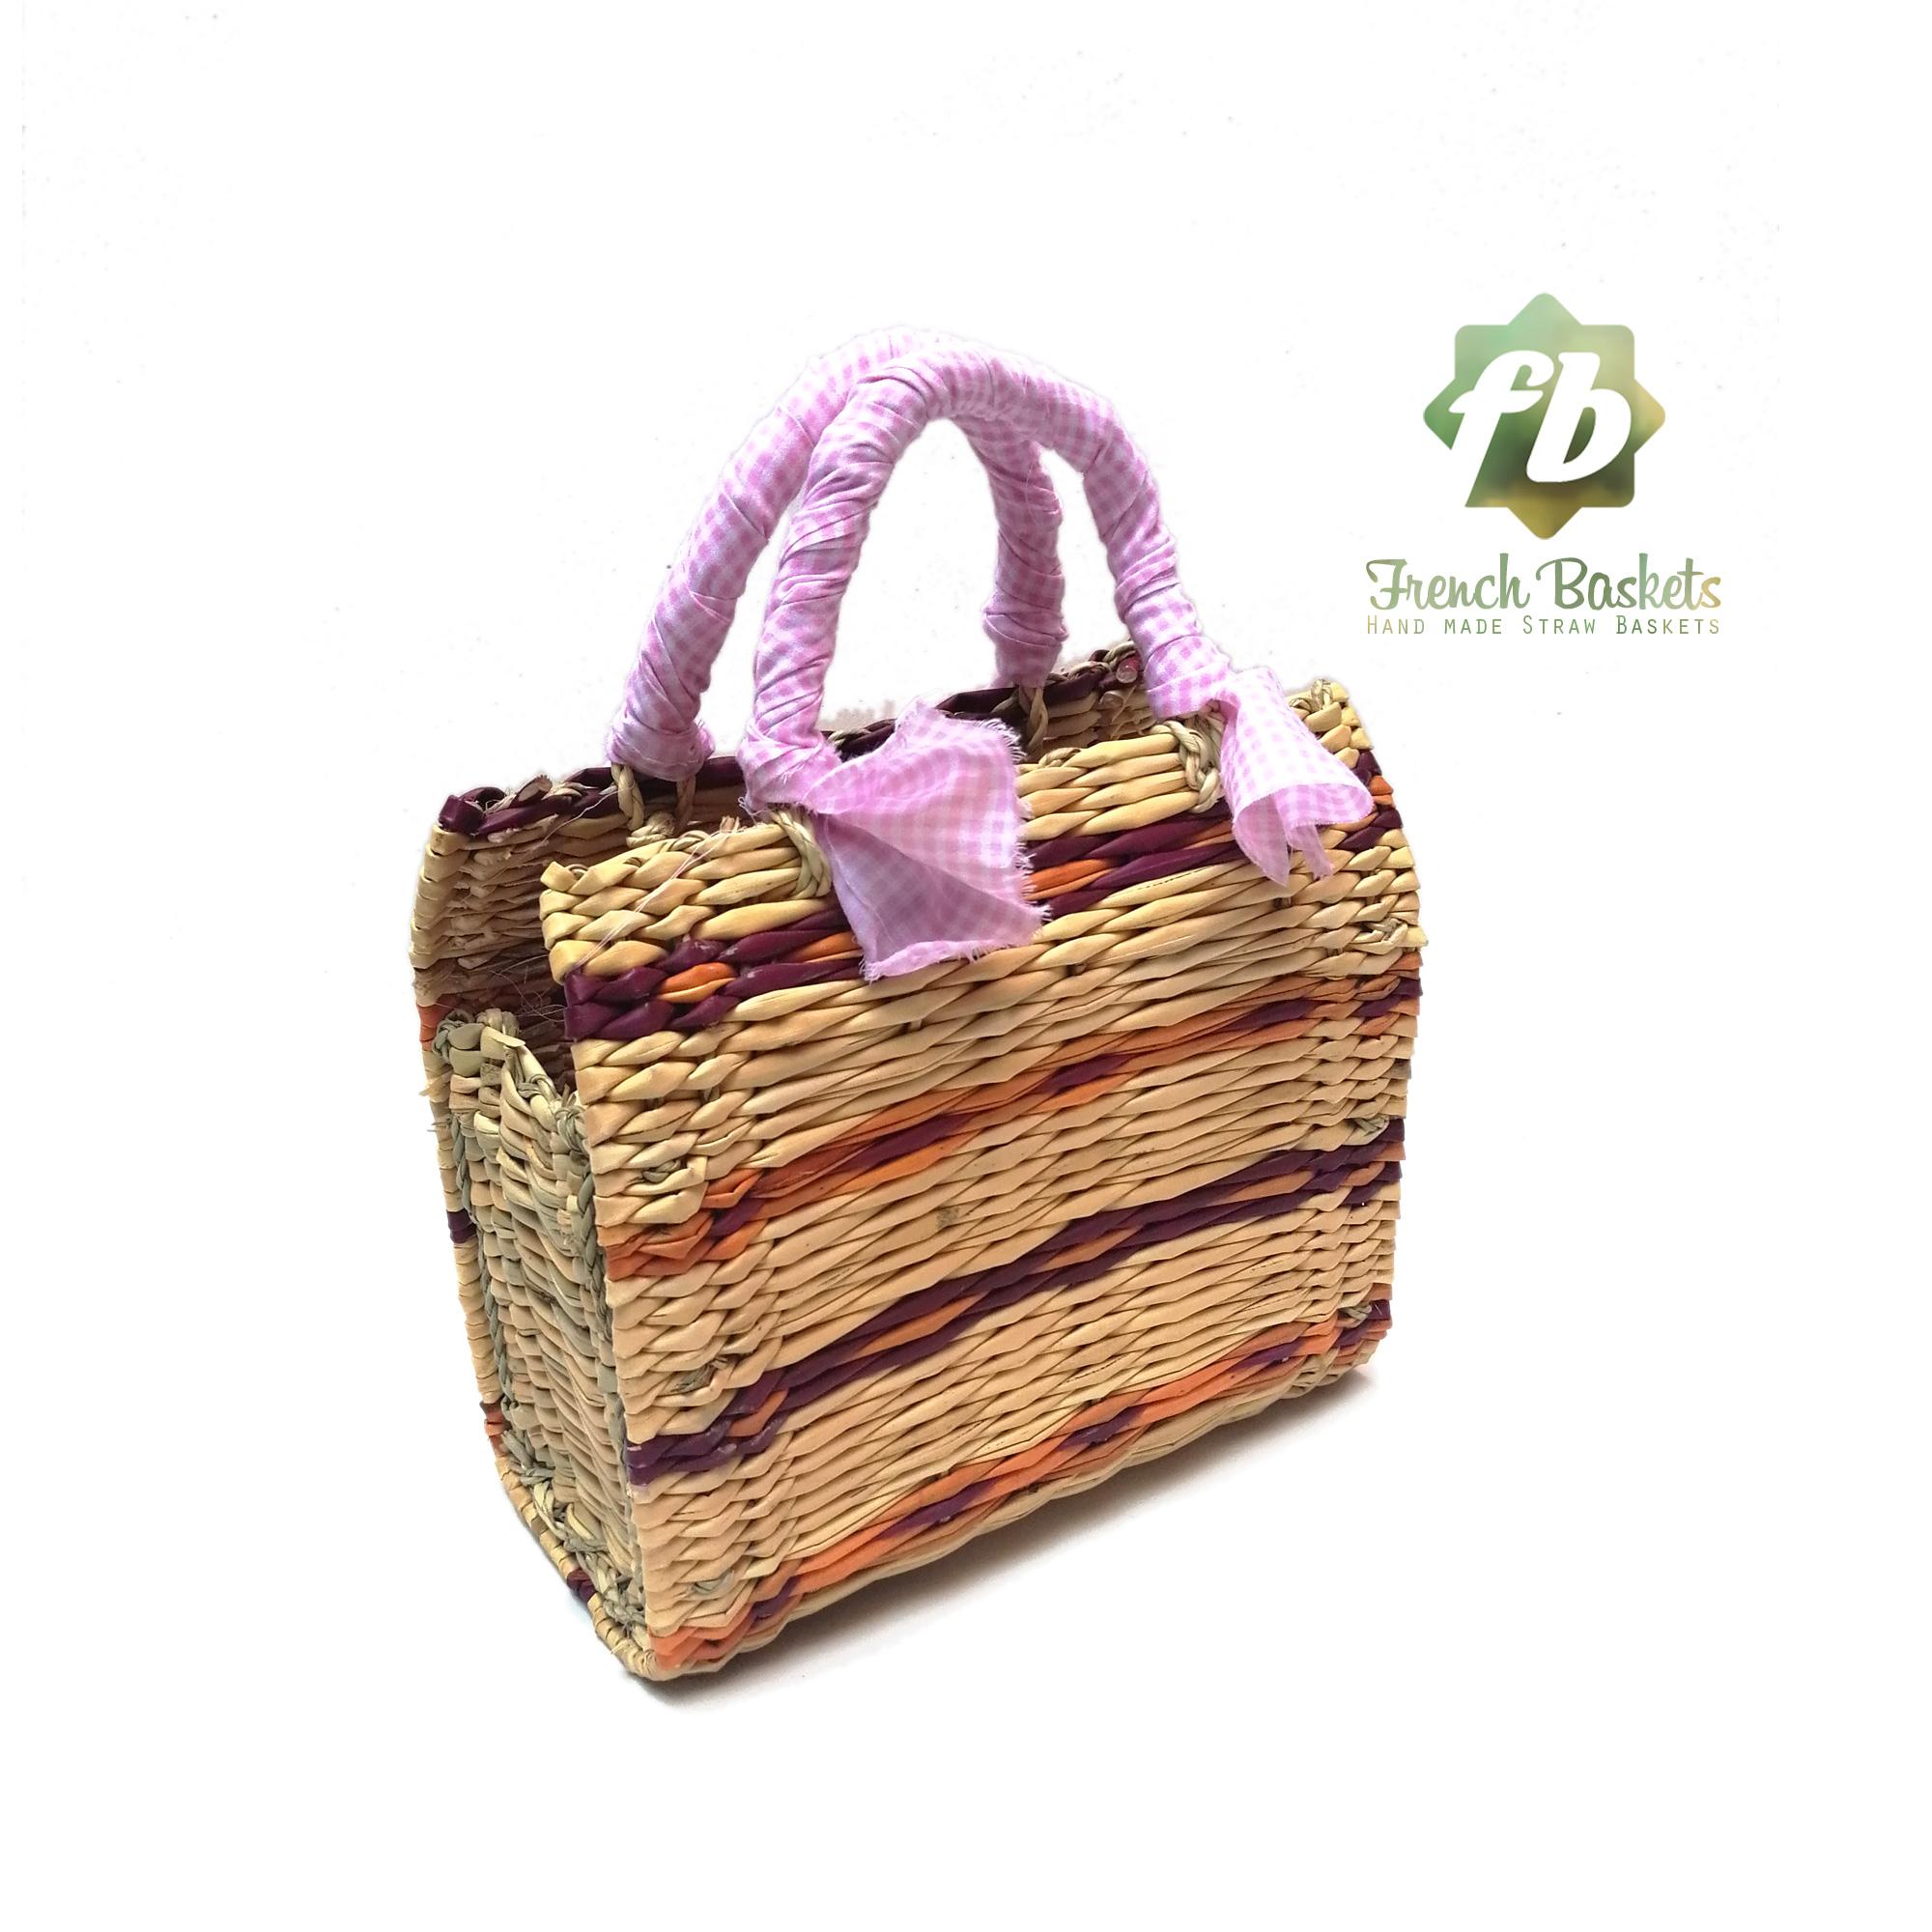 Straw handbag french baskets pink